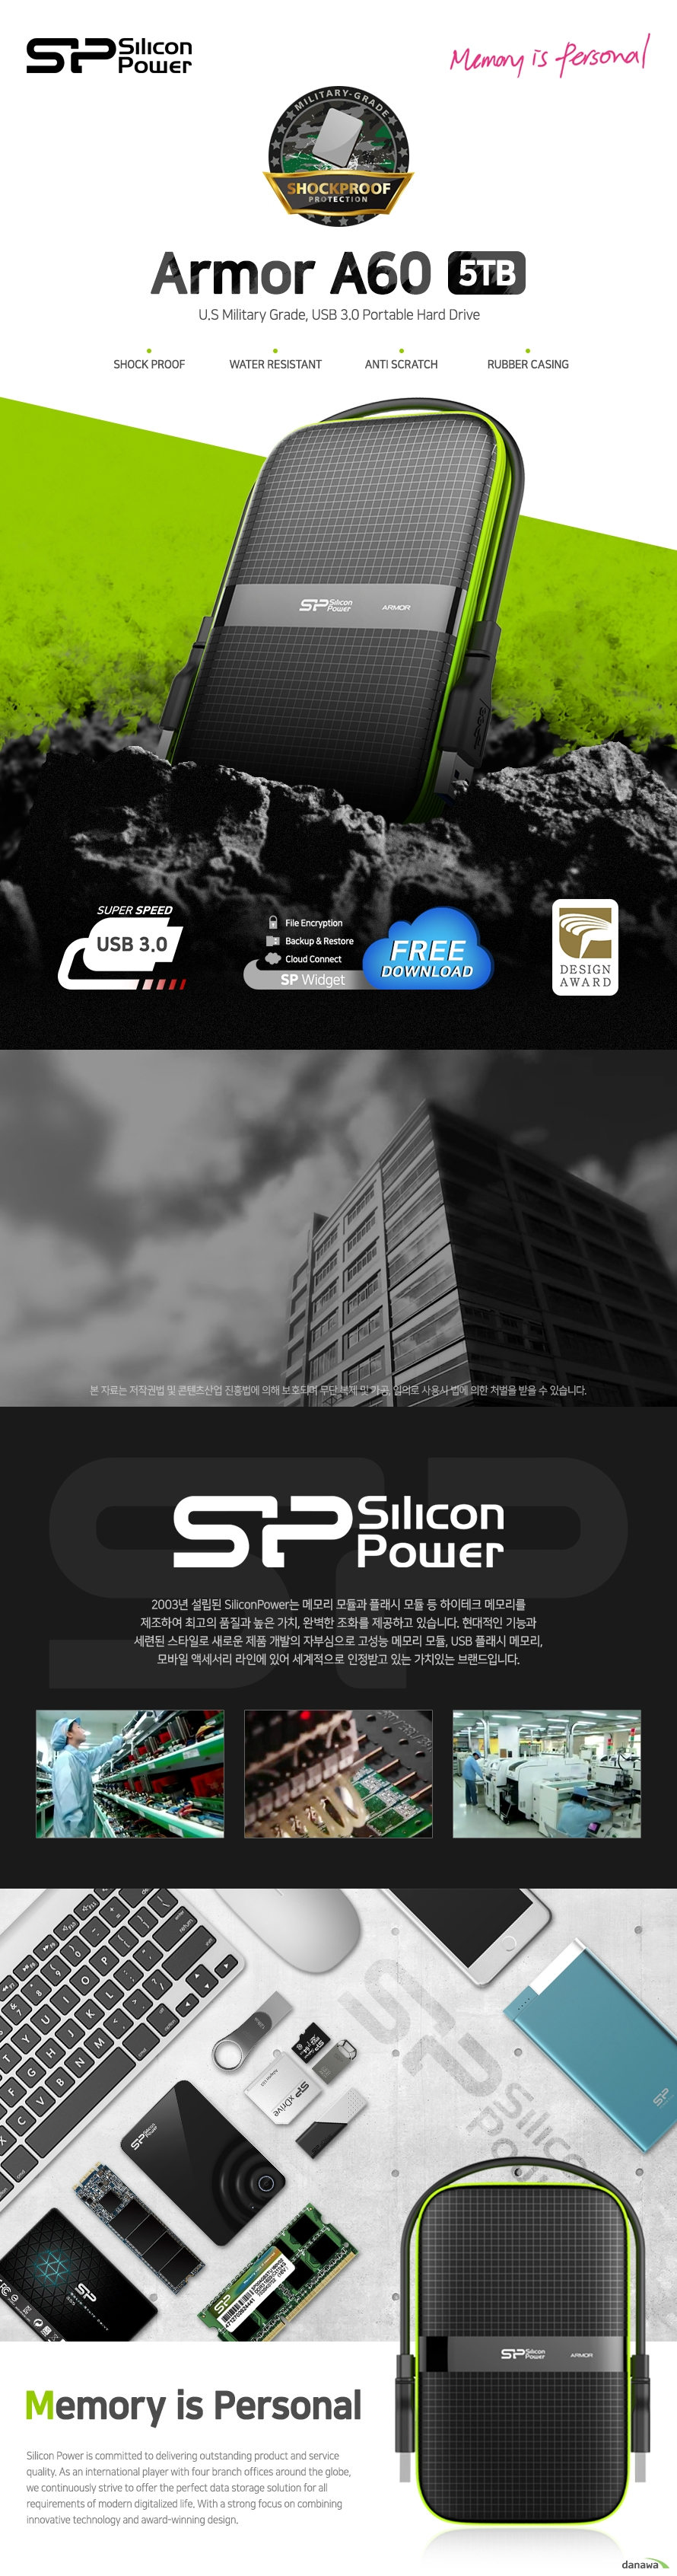 SiliconPower Armor A60 (5TB)  상세스펙  인터페이스 USB 3.0  USB 2.0도 호환  크기 높이 135.8밀리미터 넓이 85.9 밀리미터 두께 23.2밀리미터  무게 228~280G  용량 5테라바이트 작동 온도 5도에서 55도 저장 온도 영하 40도에서 영상 70도 전원 공급 dc 5볼트 보증 기간 3년 운영체제 지원 윈도우 10 8.1 8 7 xp 맥 10.5이상 리눅스 2.6.31 이상  kc인증 MSIP REM SLL A60 수입사 주 파인인포메이션